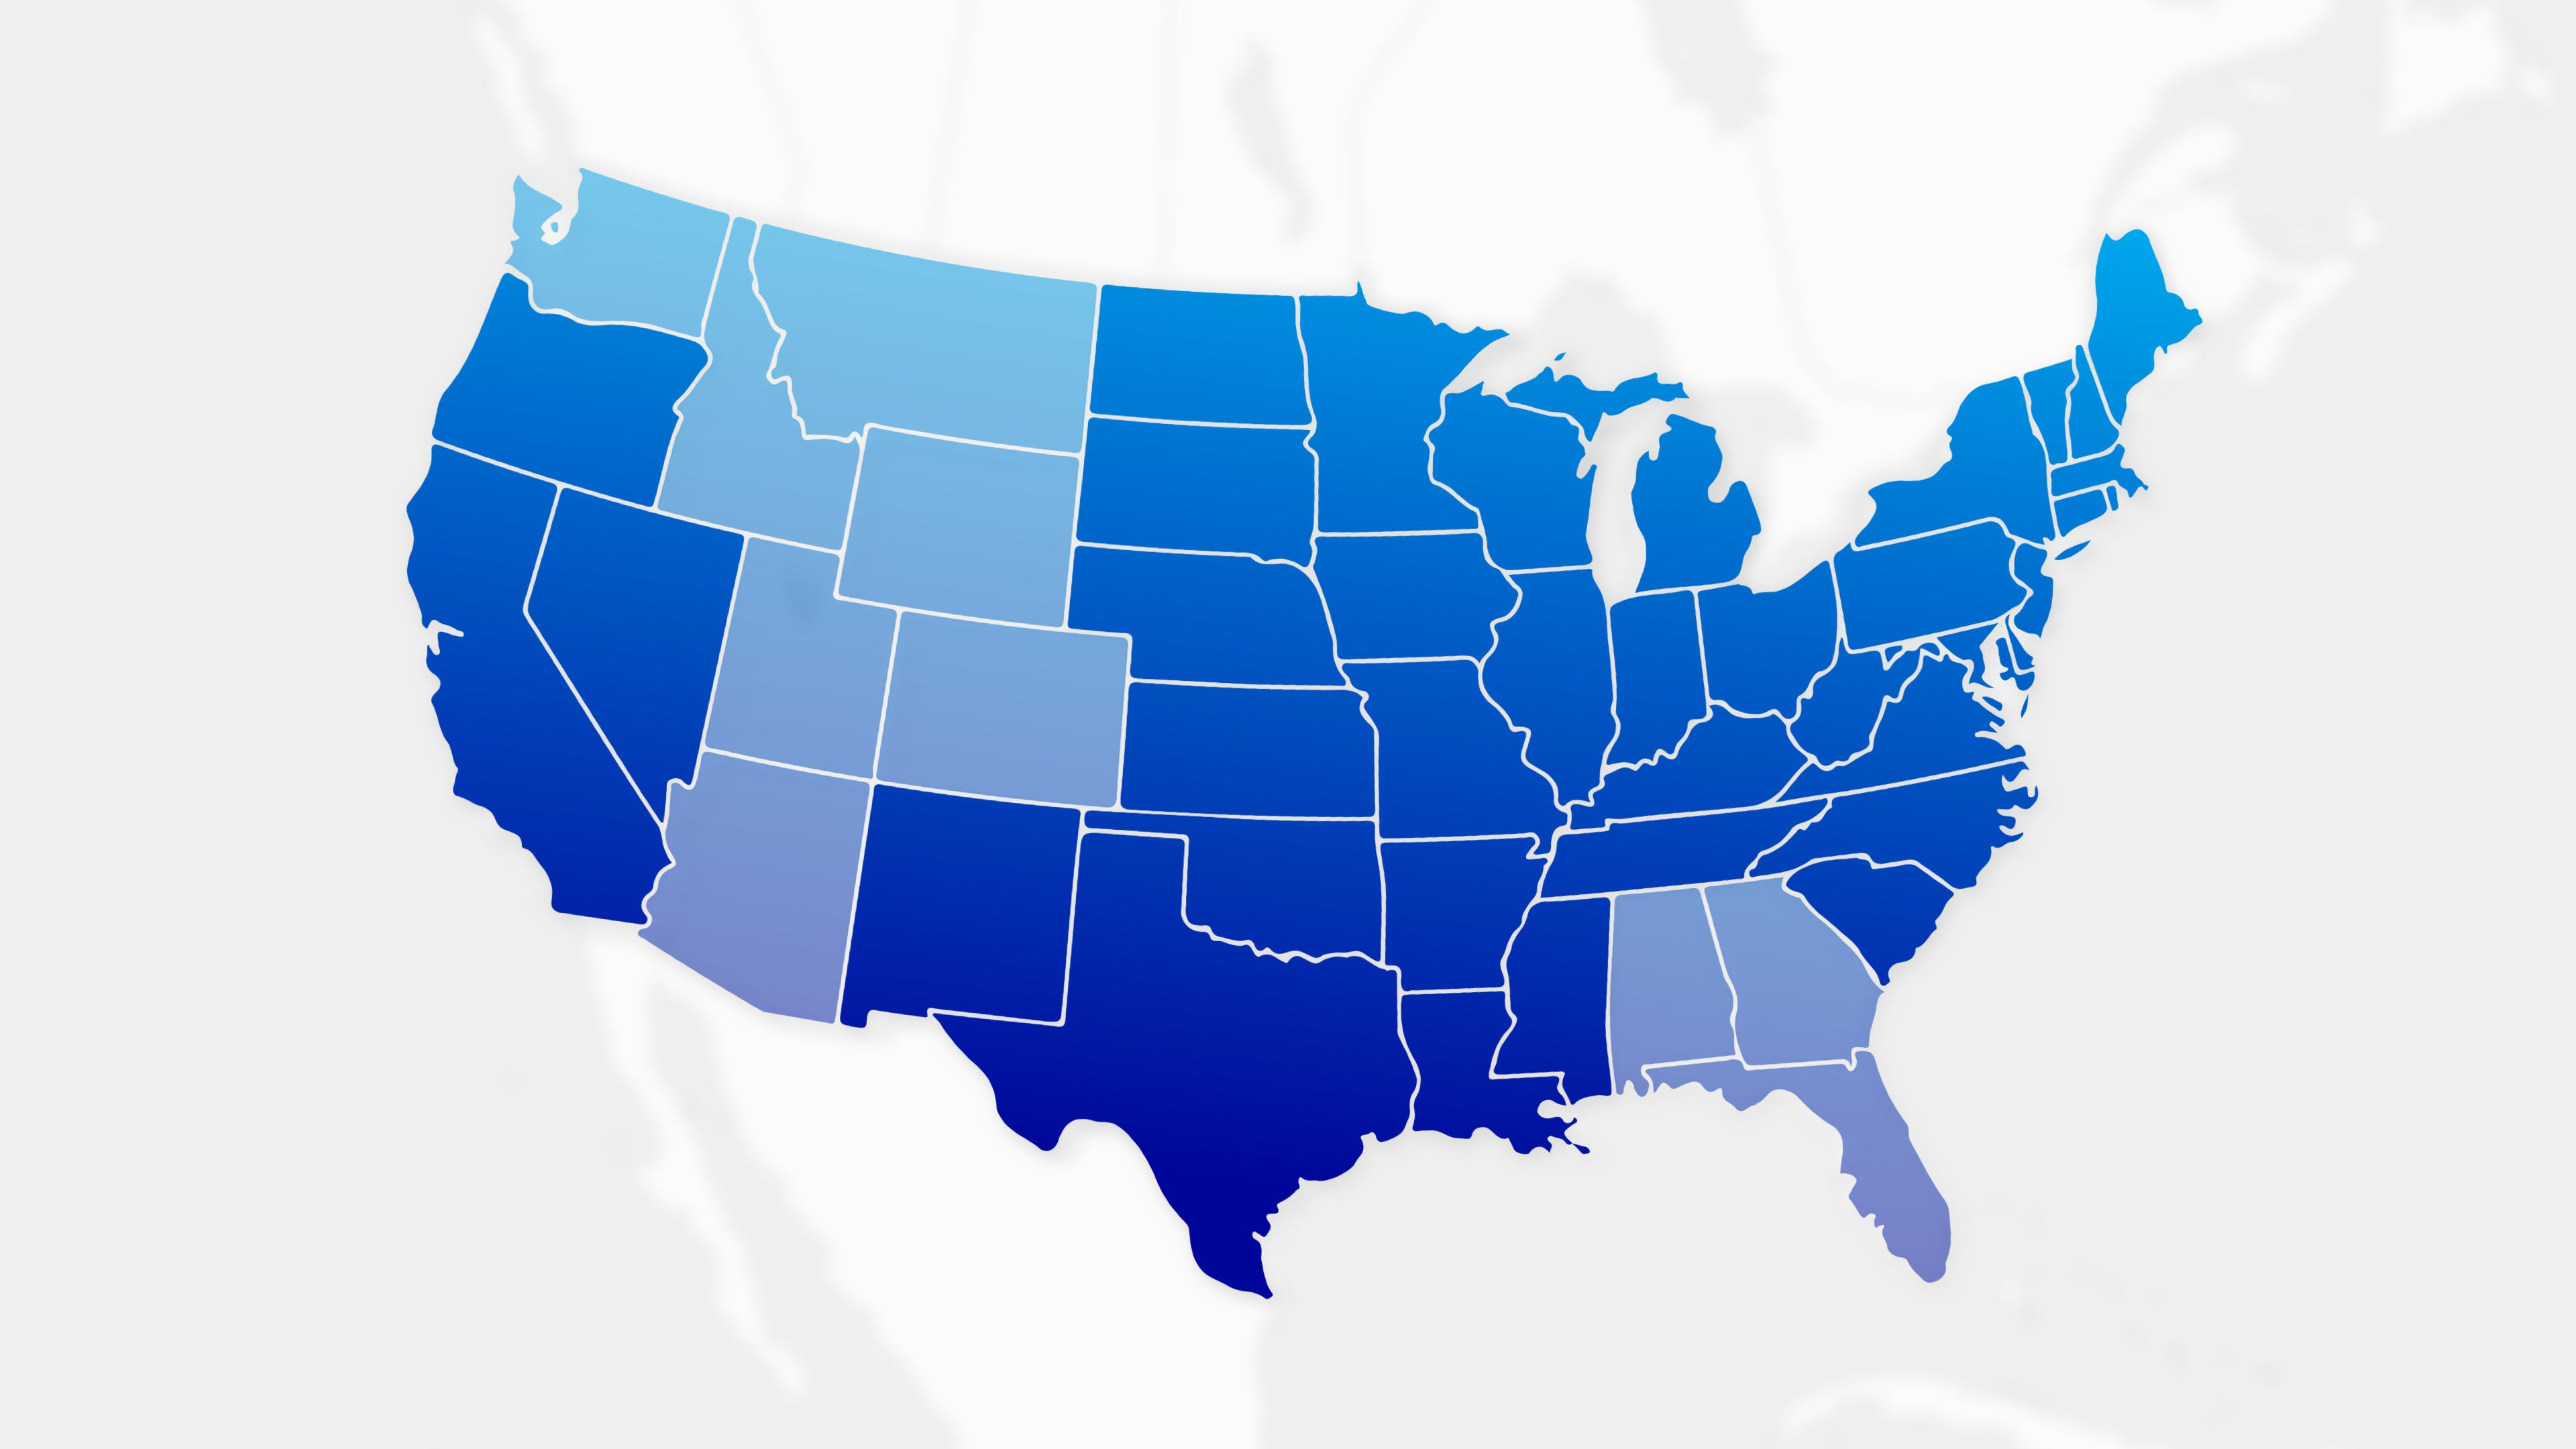 New improved Shadow across the US - coast to coast